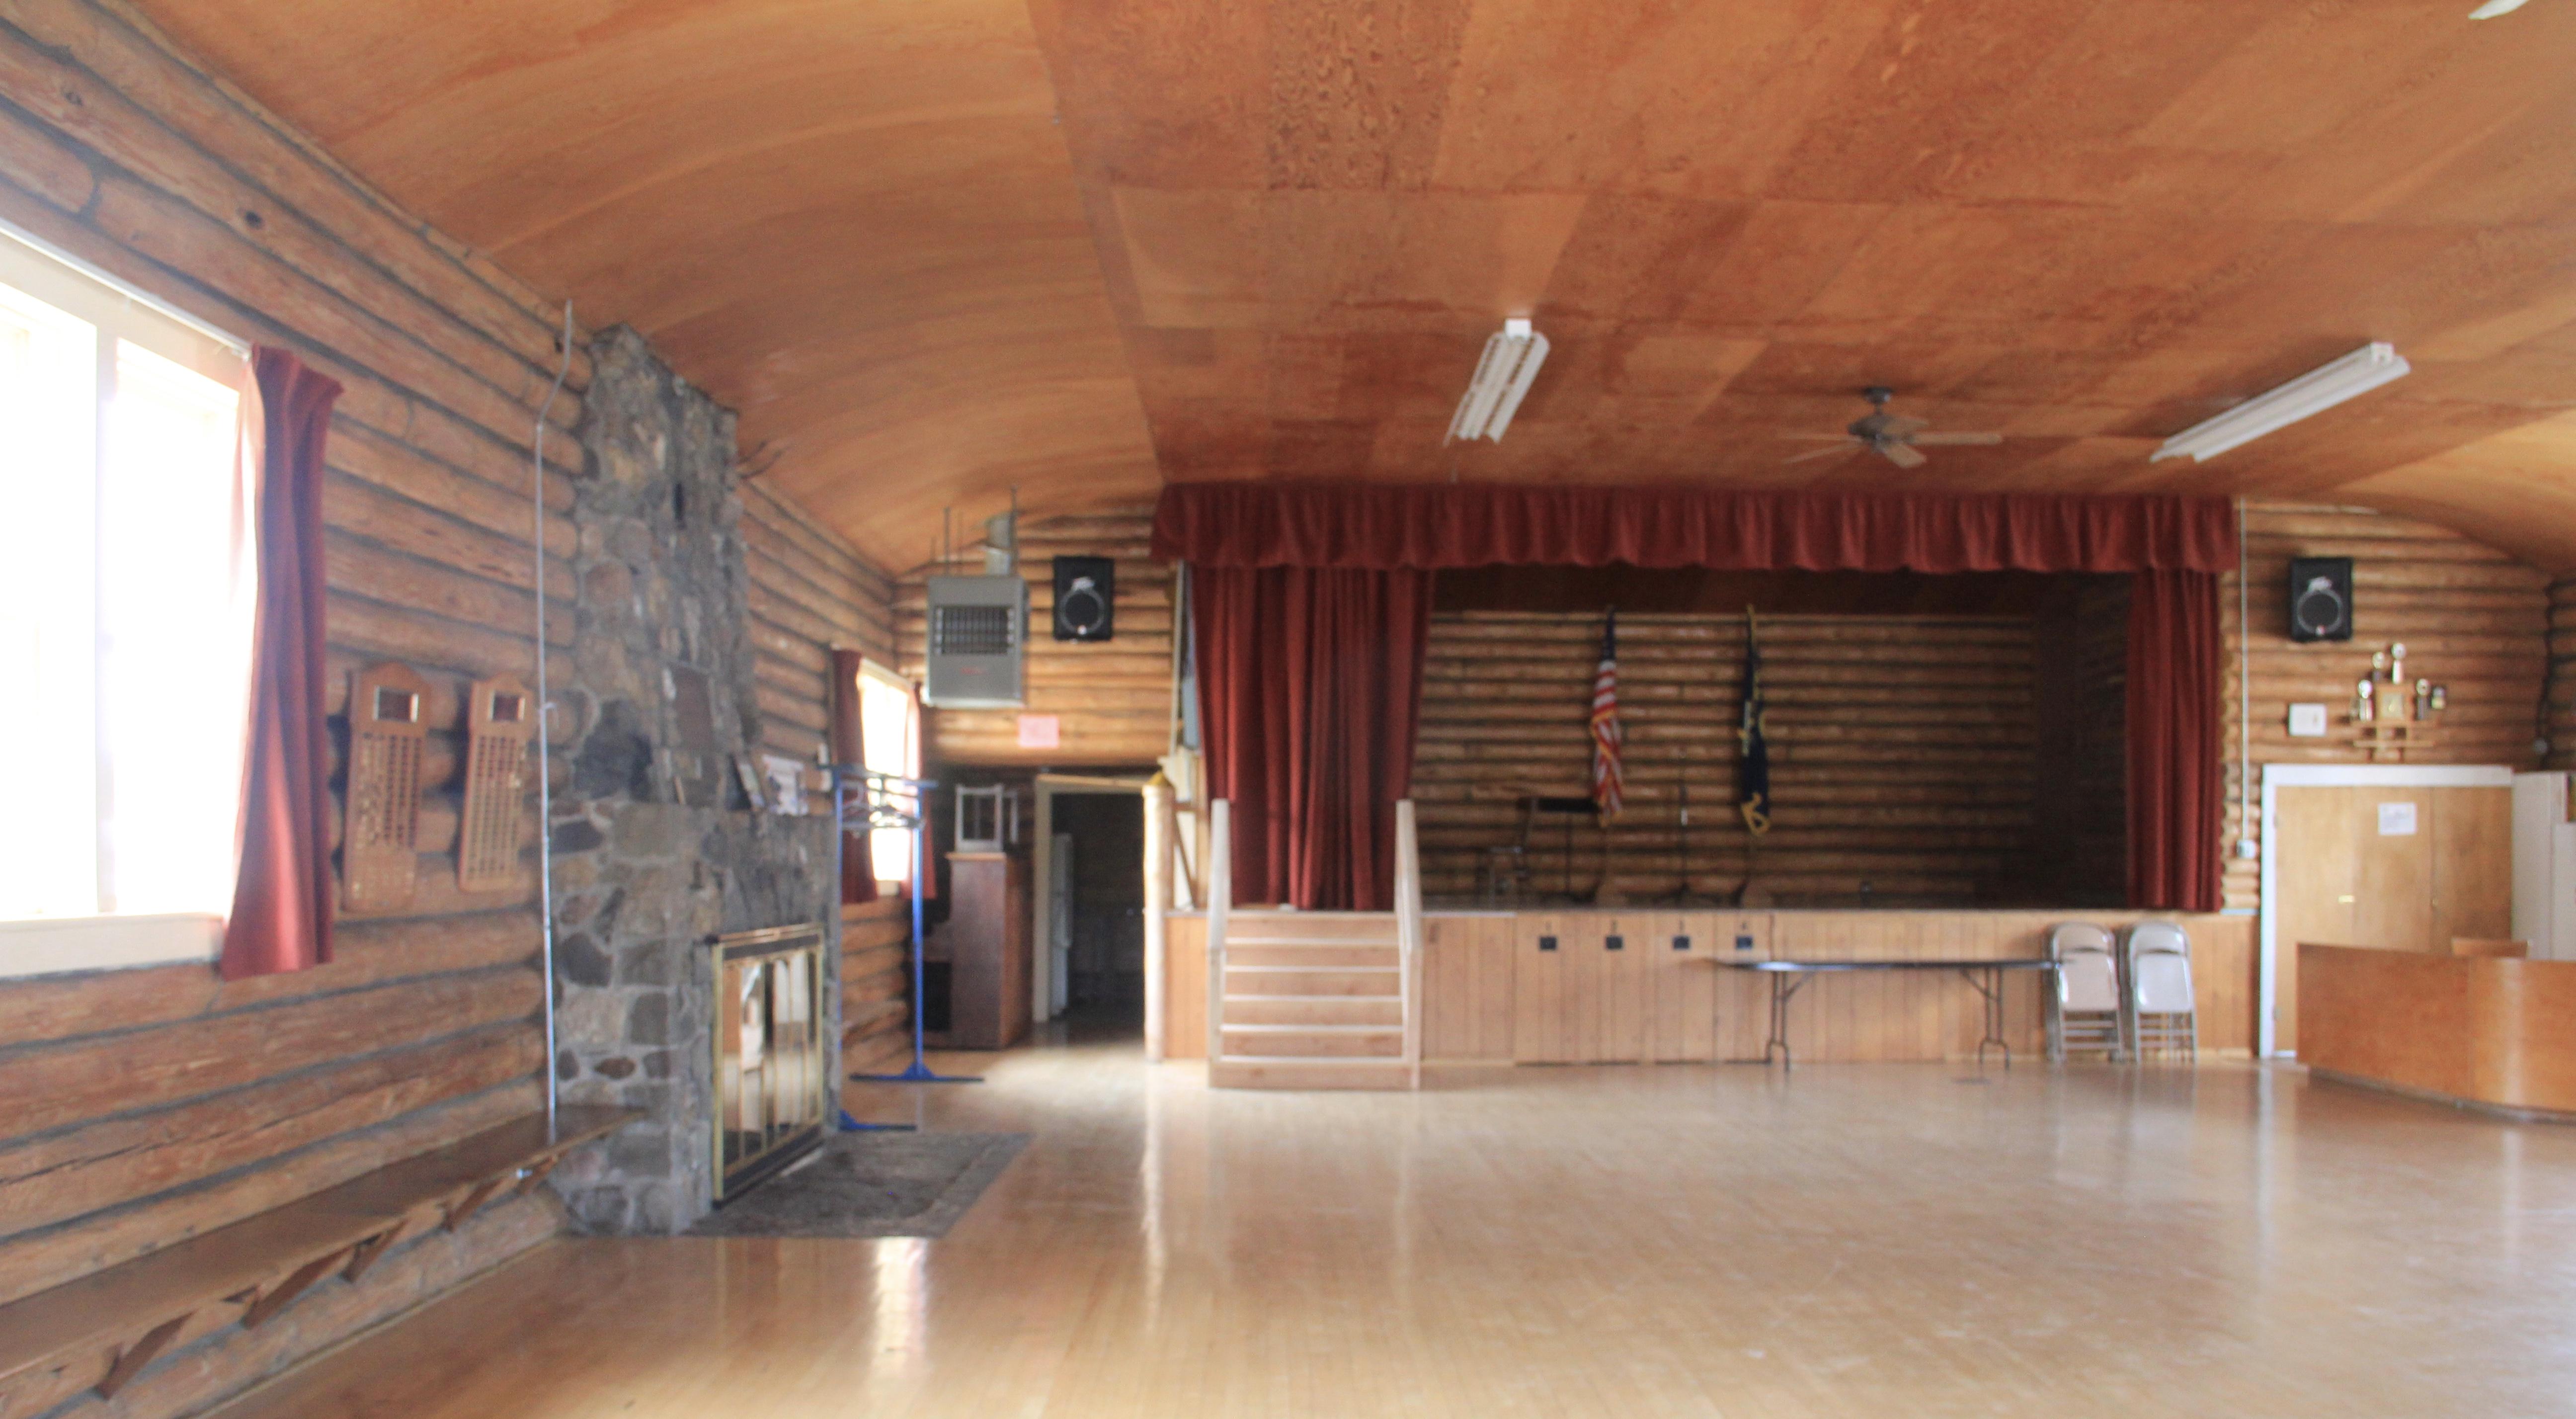 Avon Community Hall 1941 New Deal interior